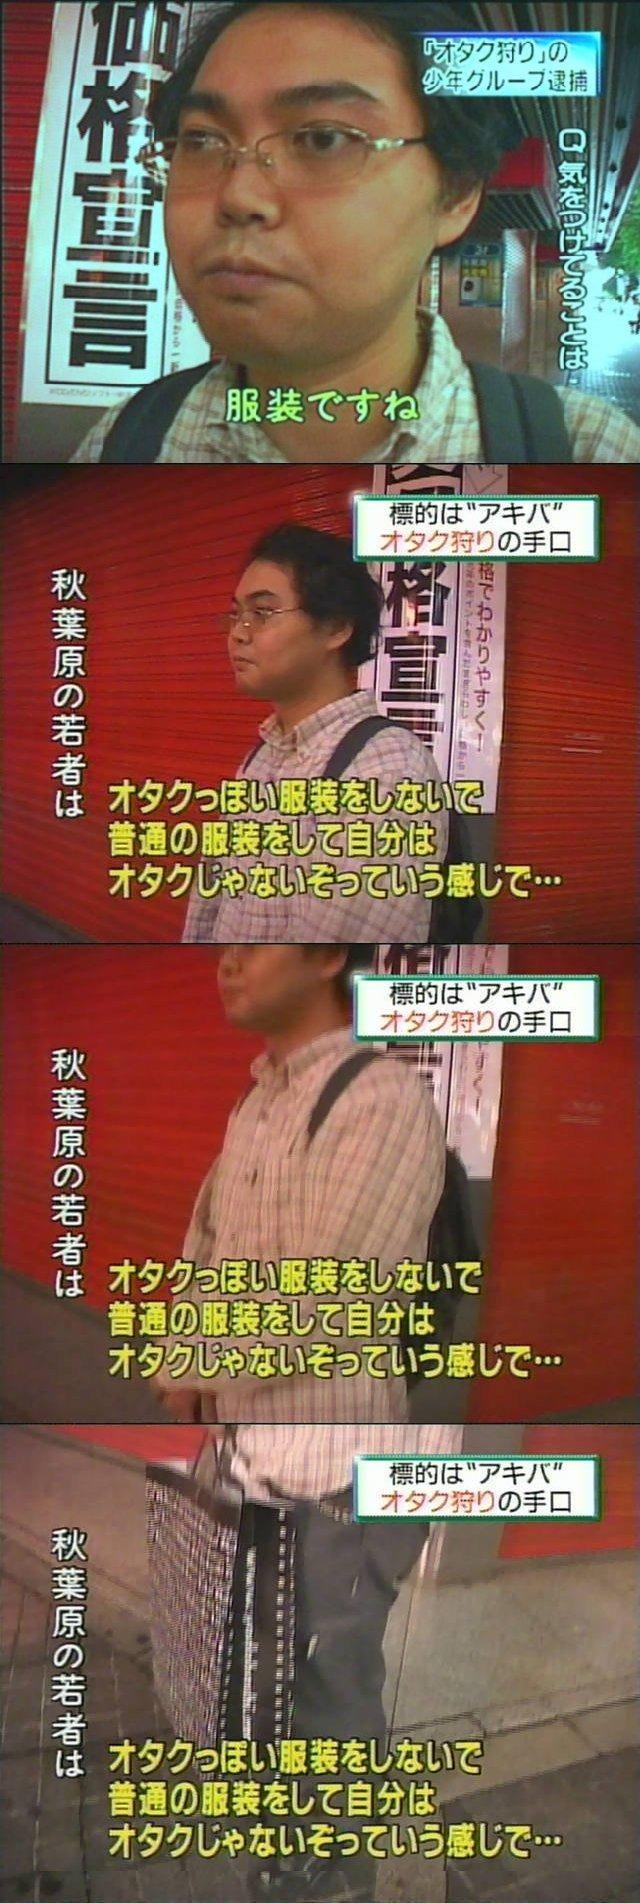 otakusan3